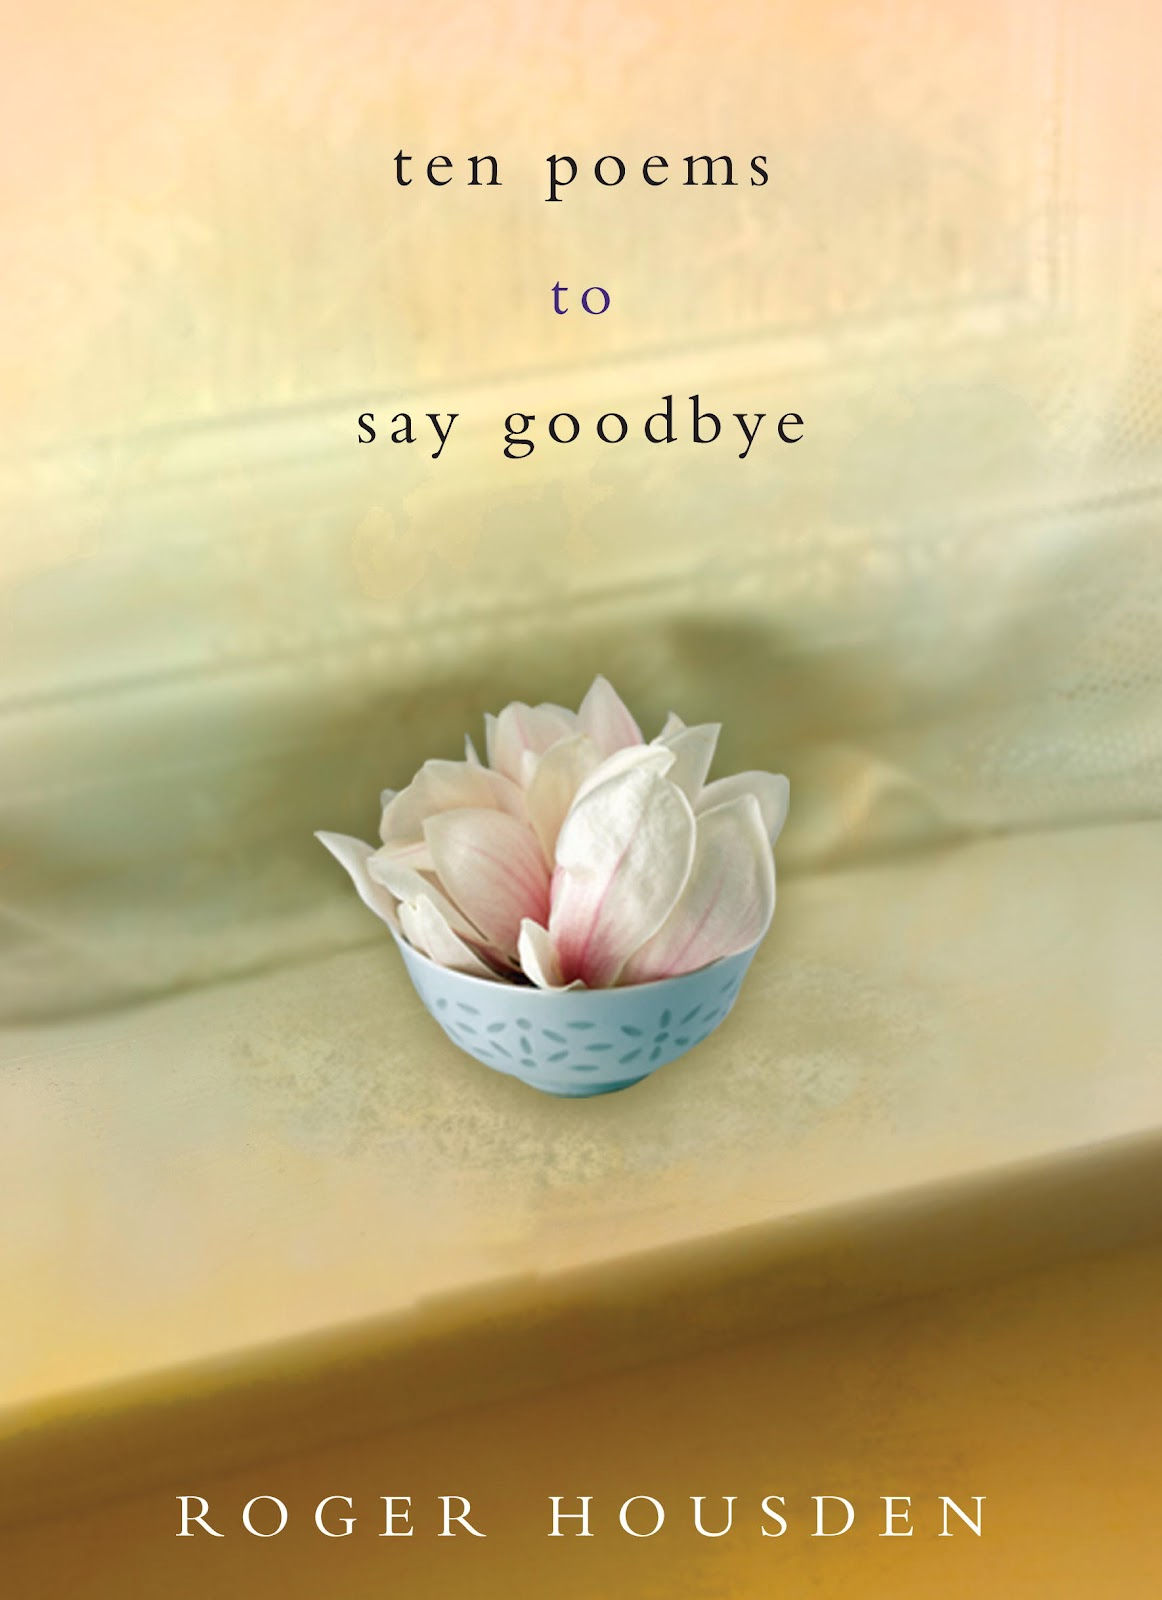 I say goodbye to you 6